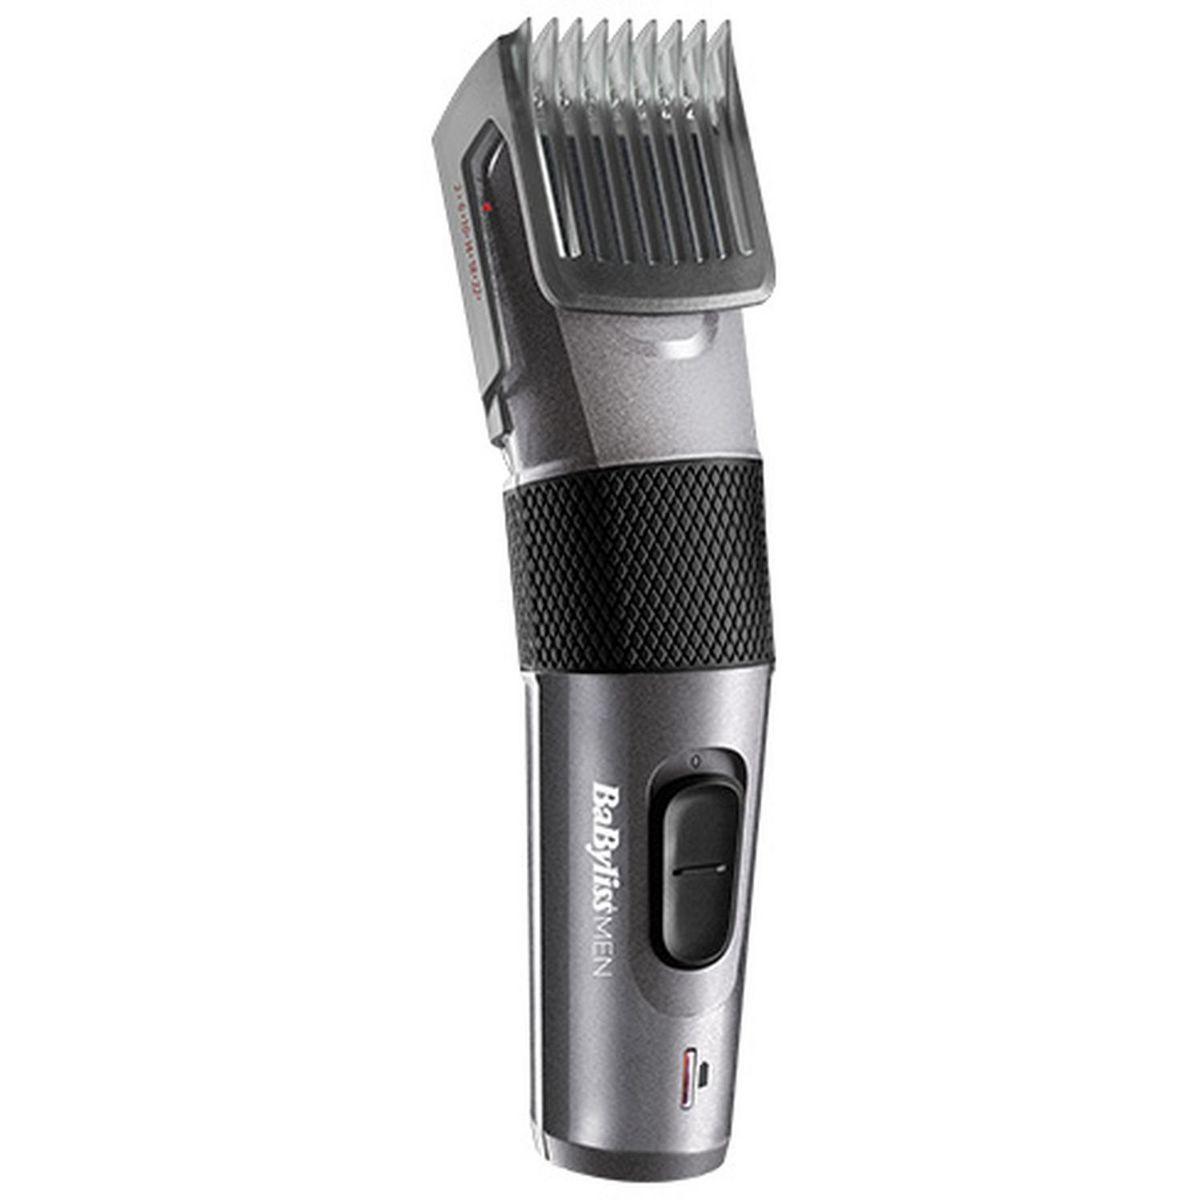 Tondeuse cheveux - E786E - Gris